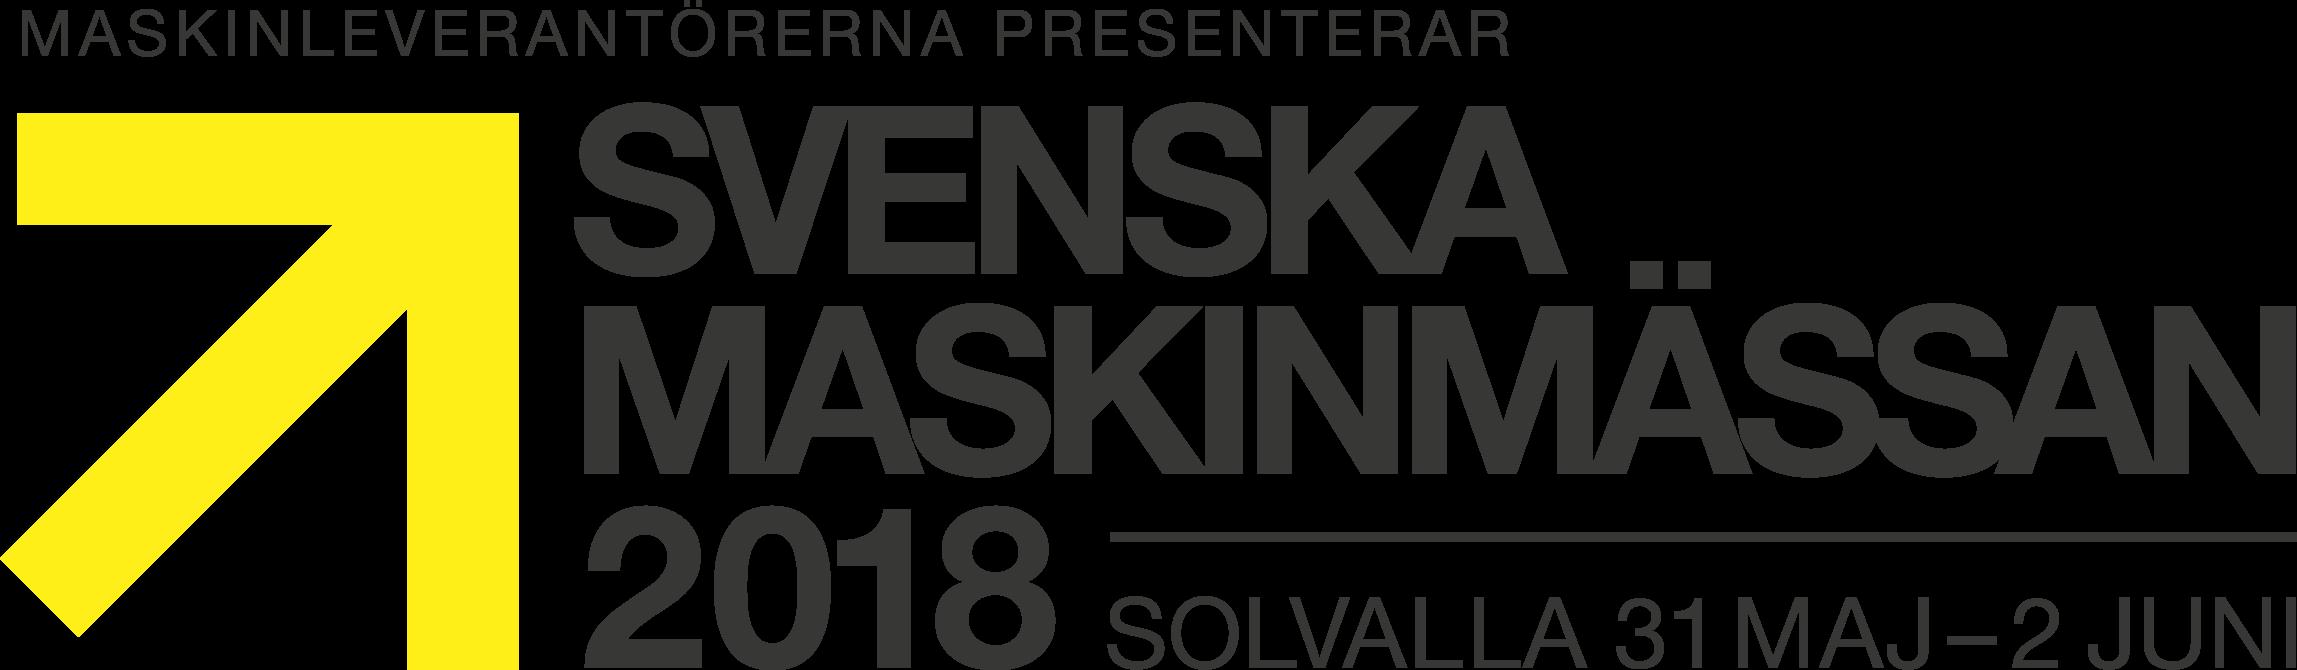 Svenska-Maskinmssan-2018